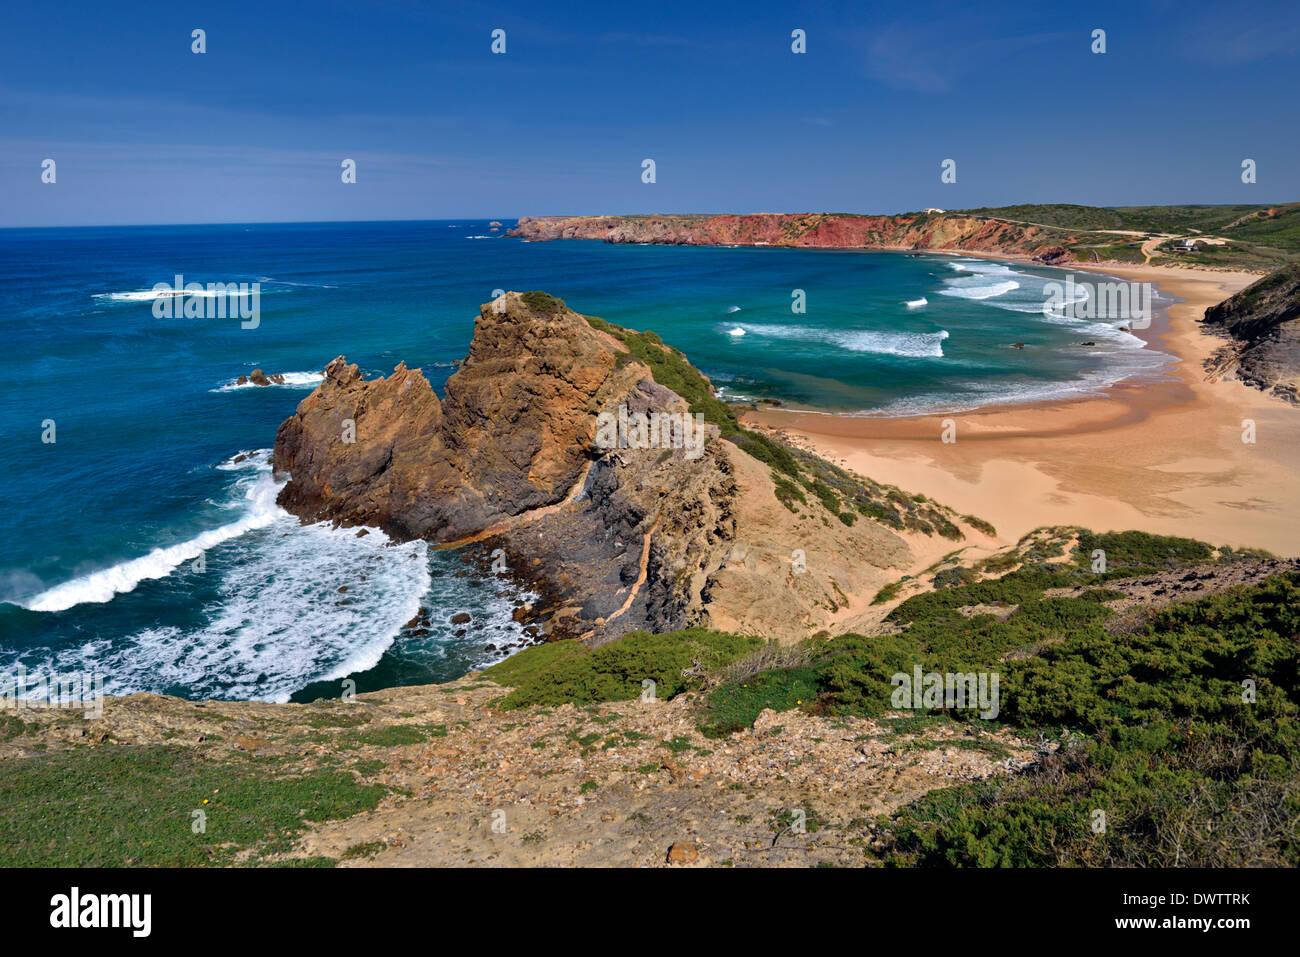 Amado Beach (Carrapateira) : 2021 Ce quil faut savoir